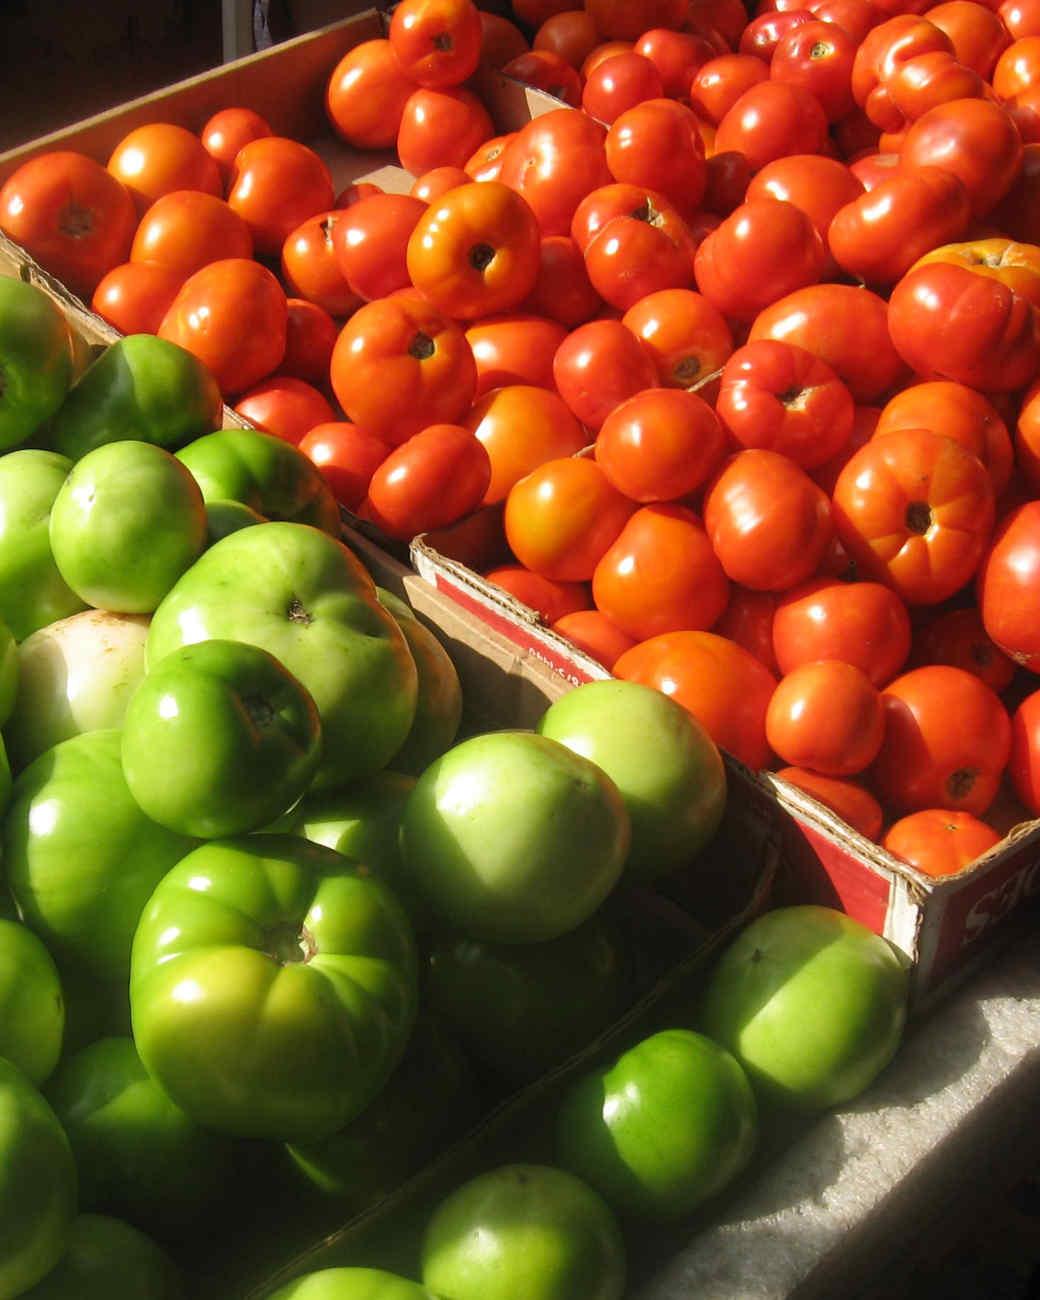 edfblg_082608_tomatoes2.jpg